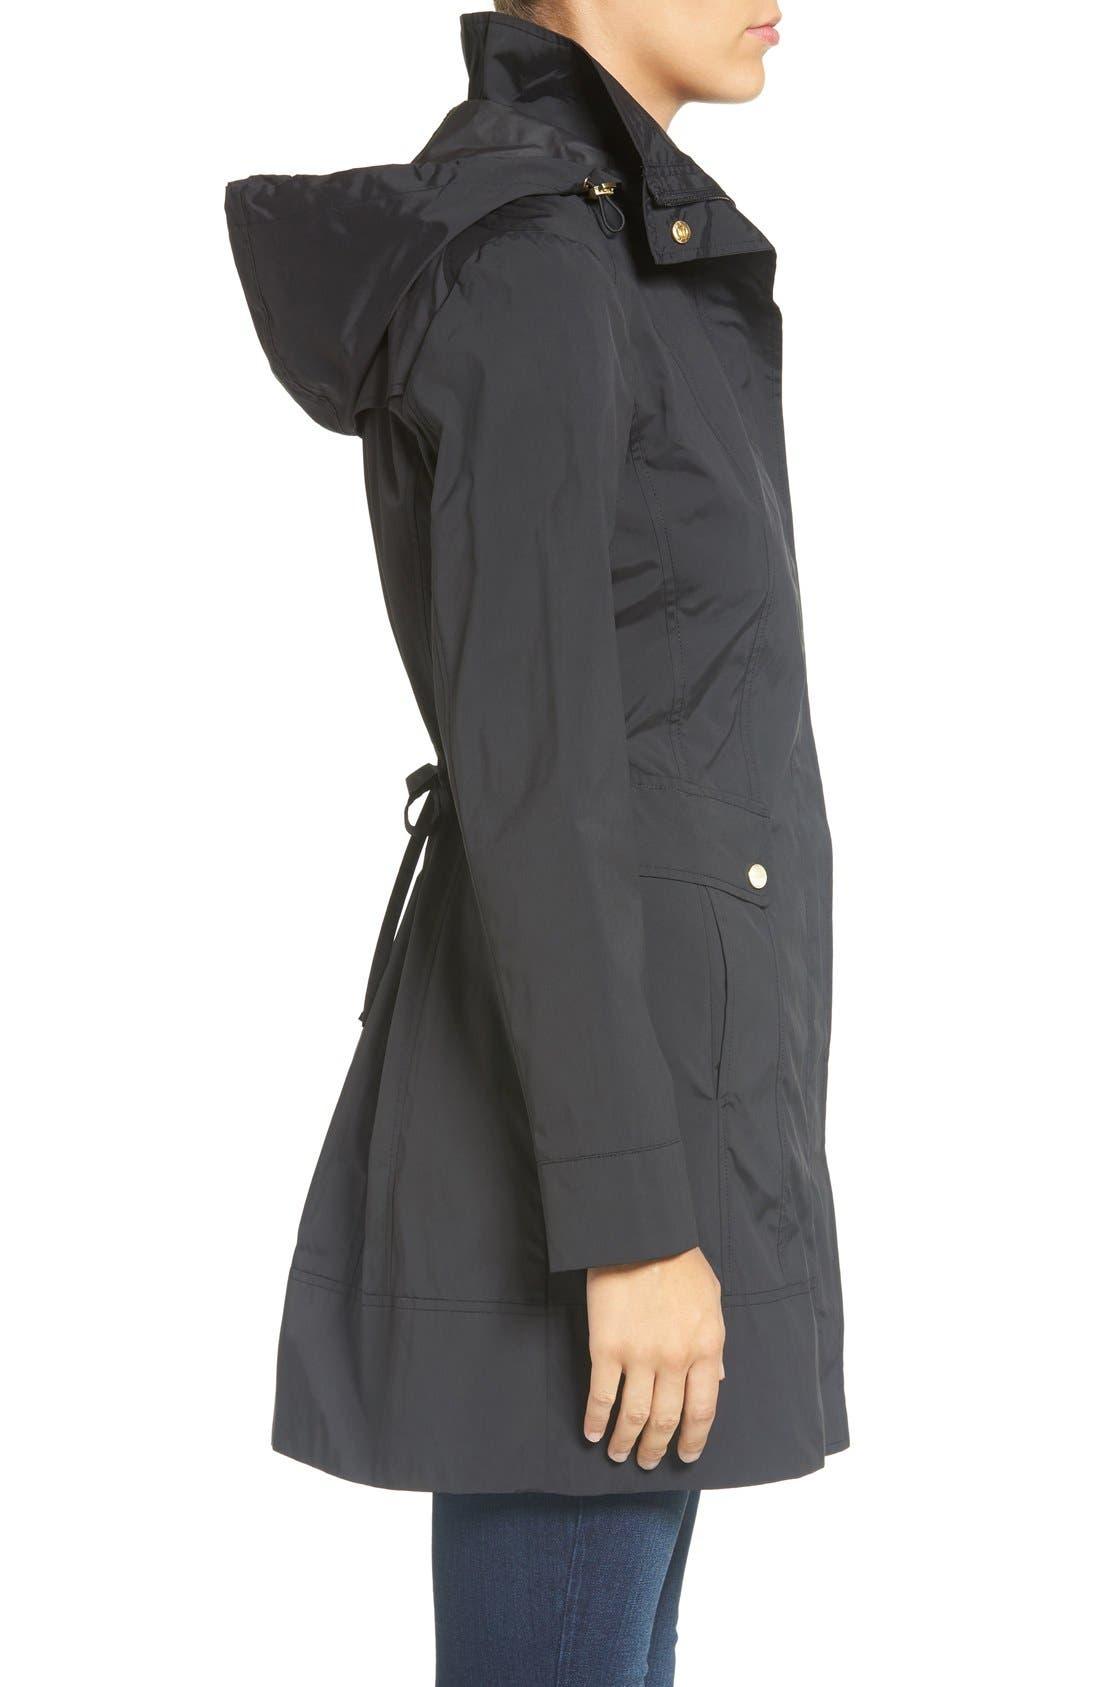 COLE HAAN SIGNATURE, Back Bow Packable Hooded Raincoat, Alternate thumbnail 5, color, BLACK